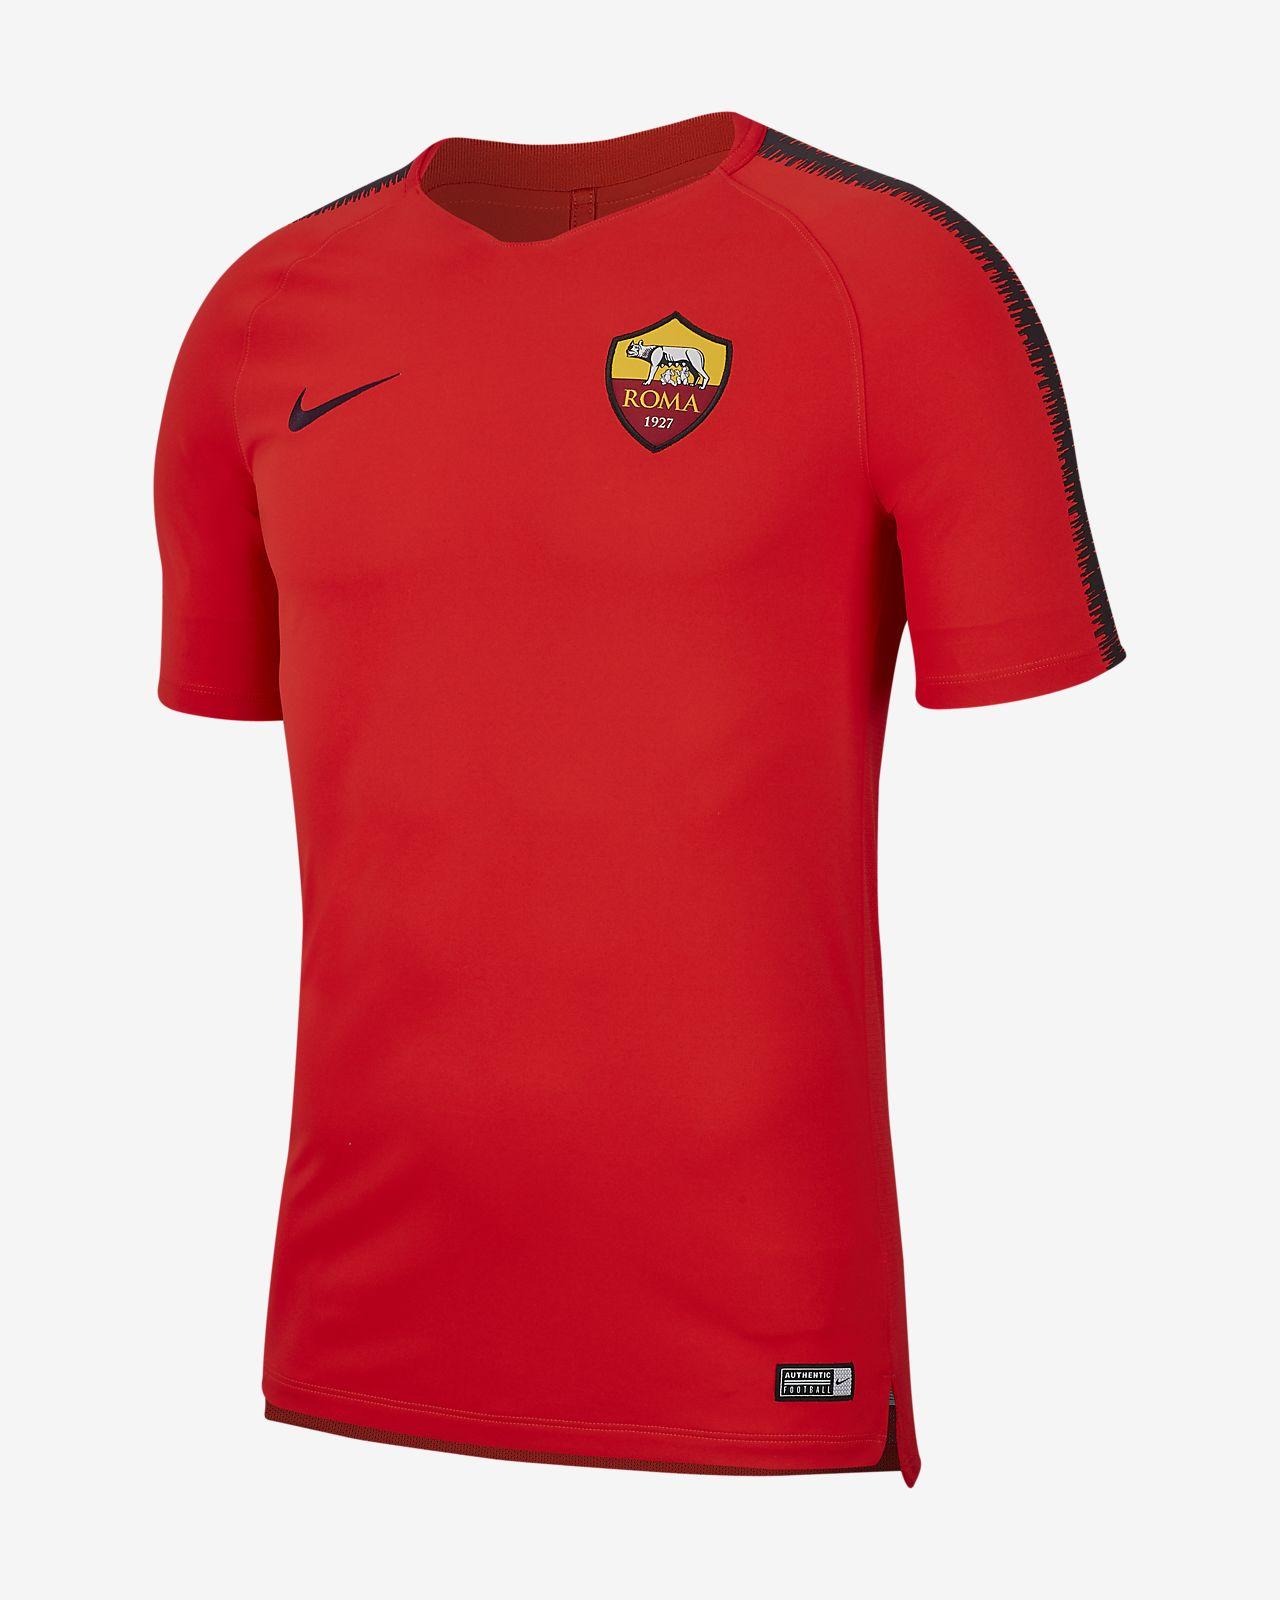 A.S. Roma Breathe Squad Men's Football Top